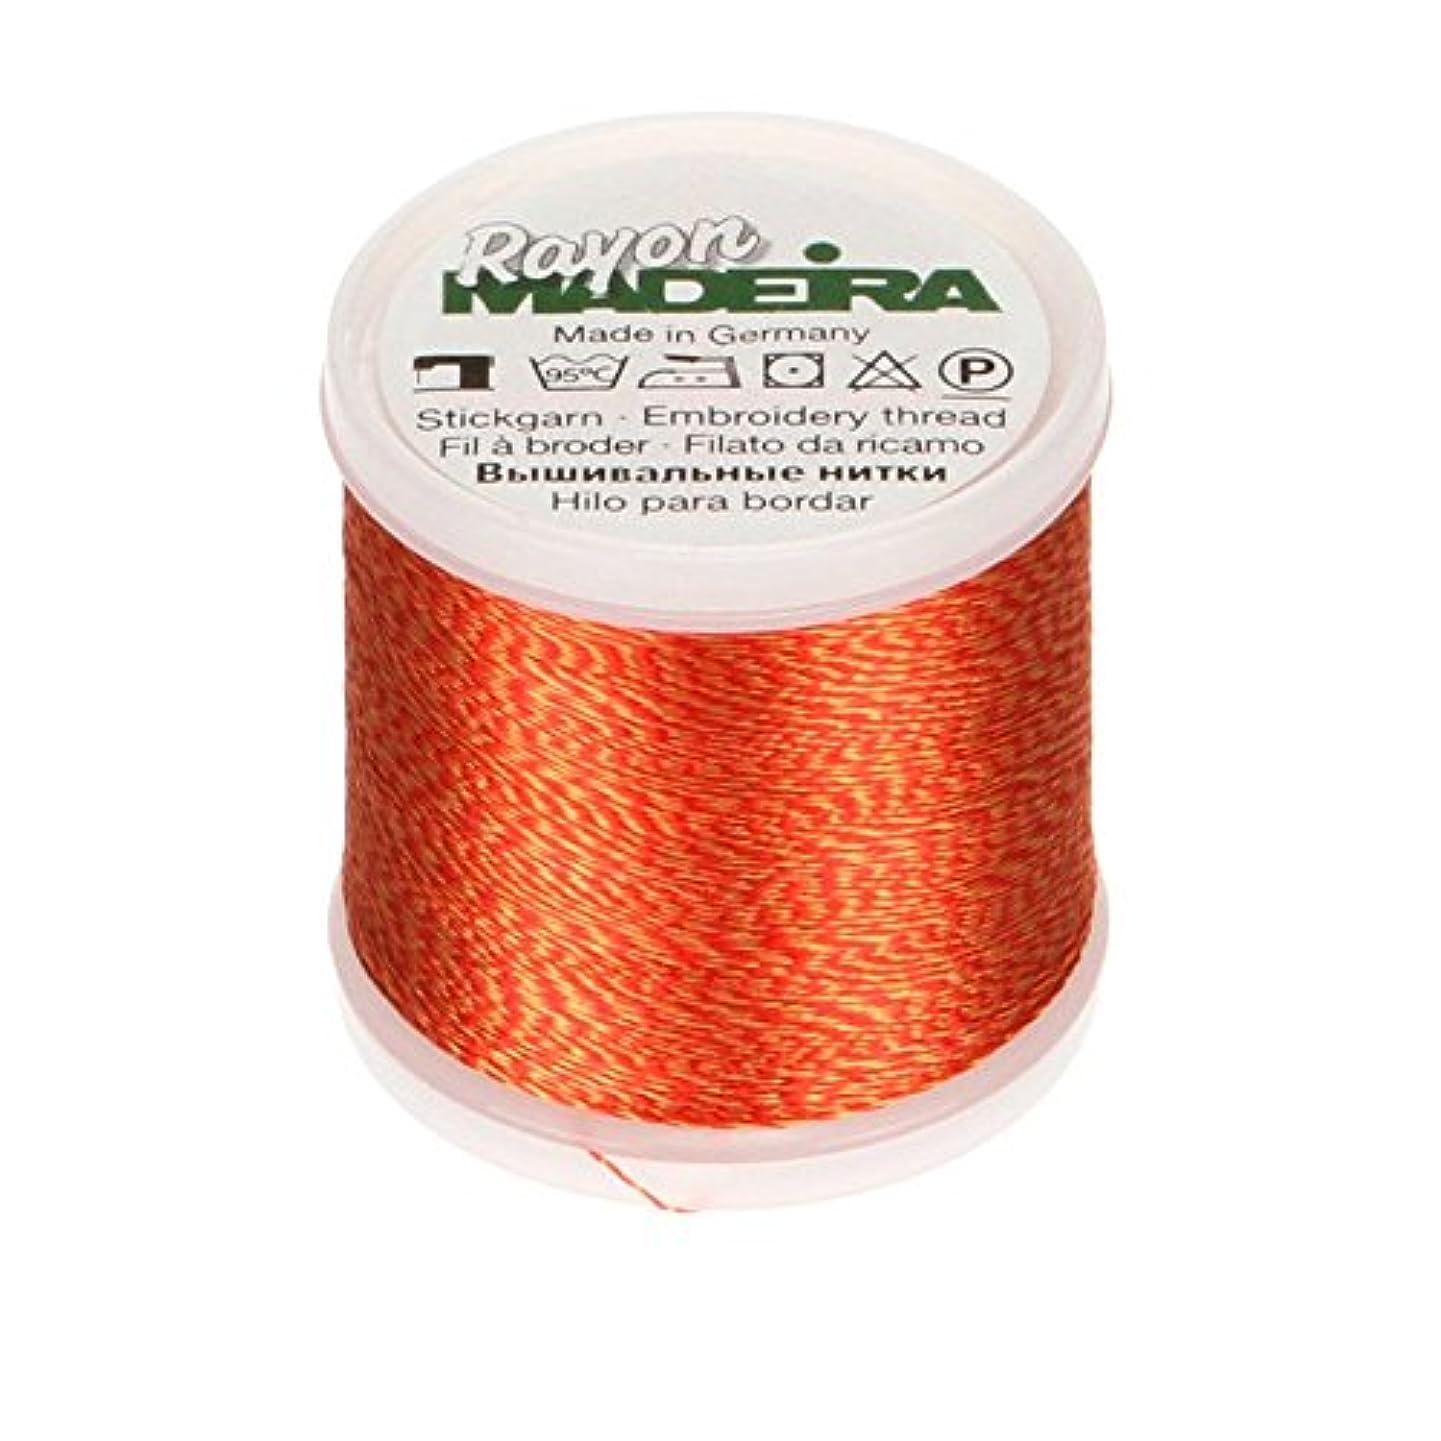 Madeira 9840-2228 Rayon Embroidery Thread, 40wt/220 yd, Mélange Caribbean